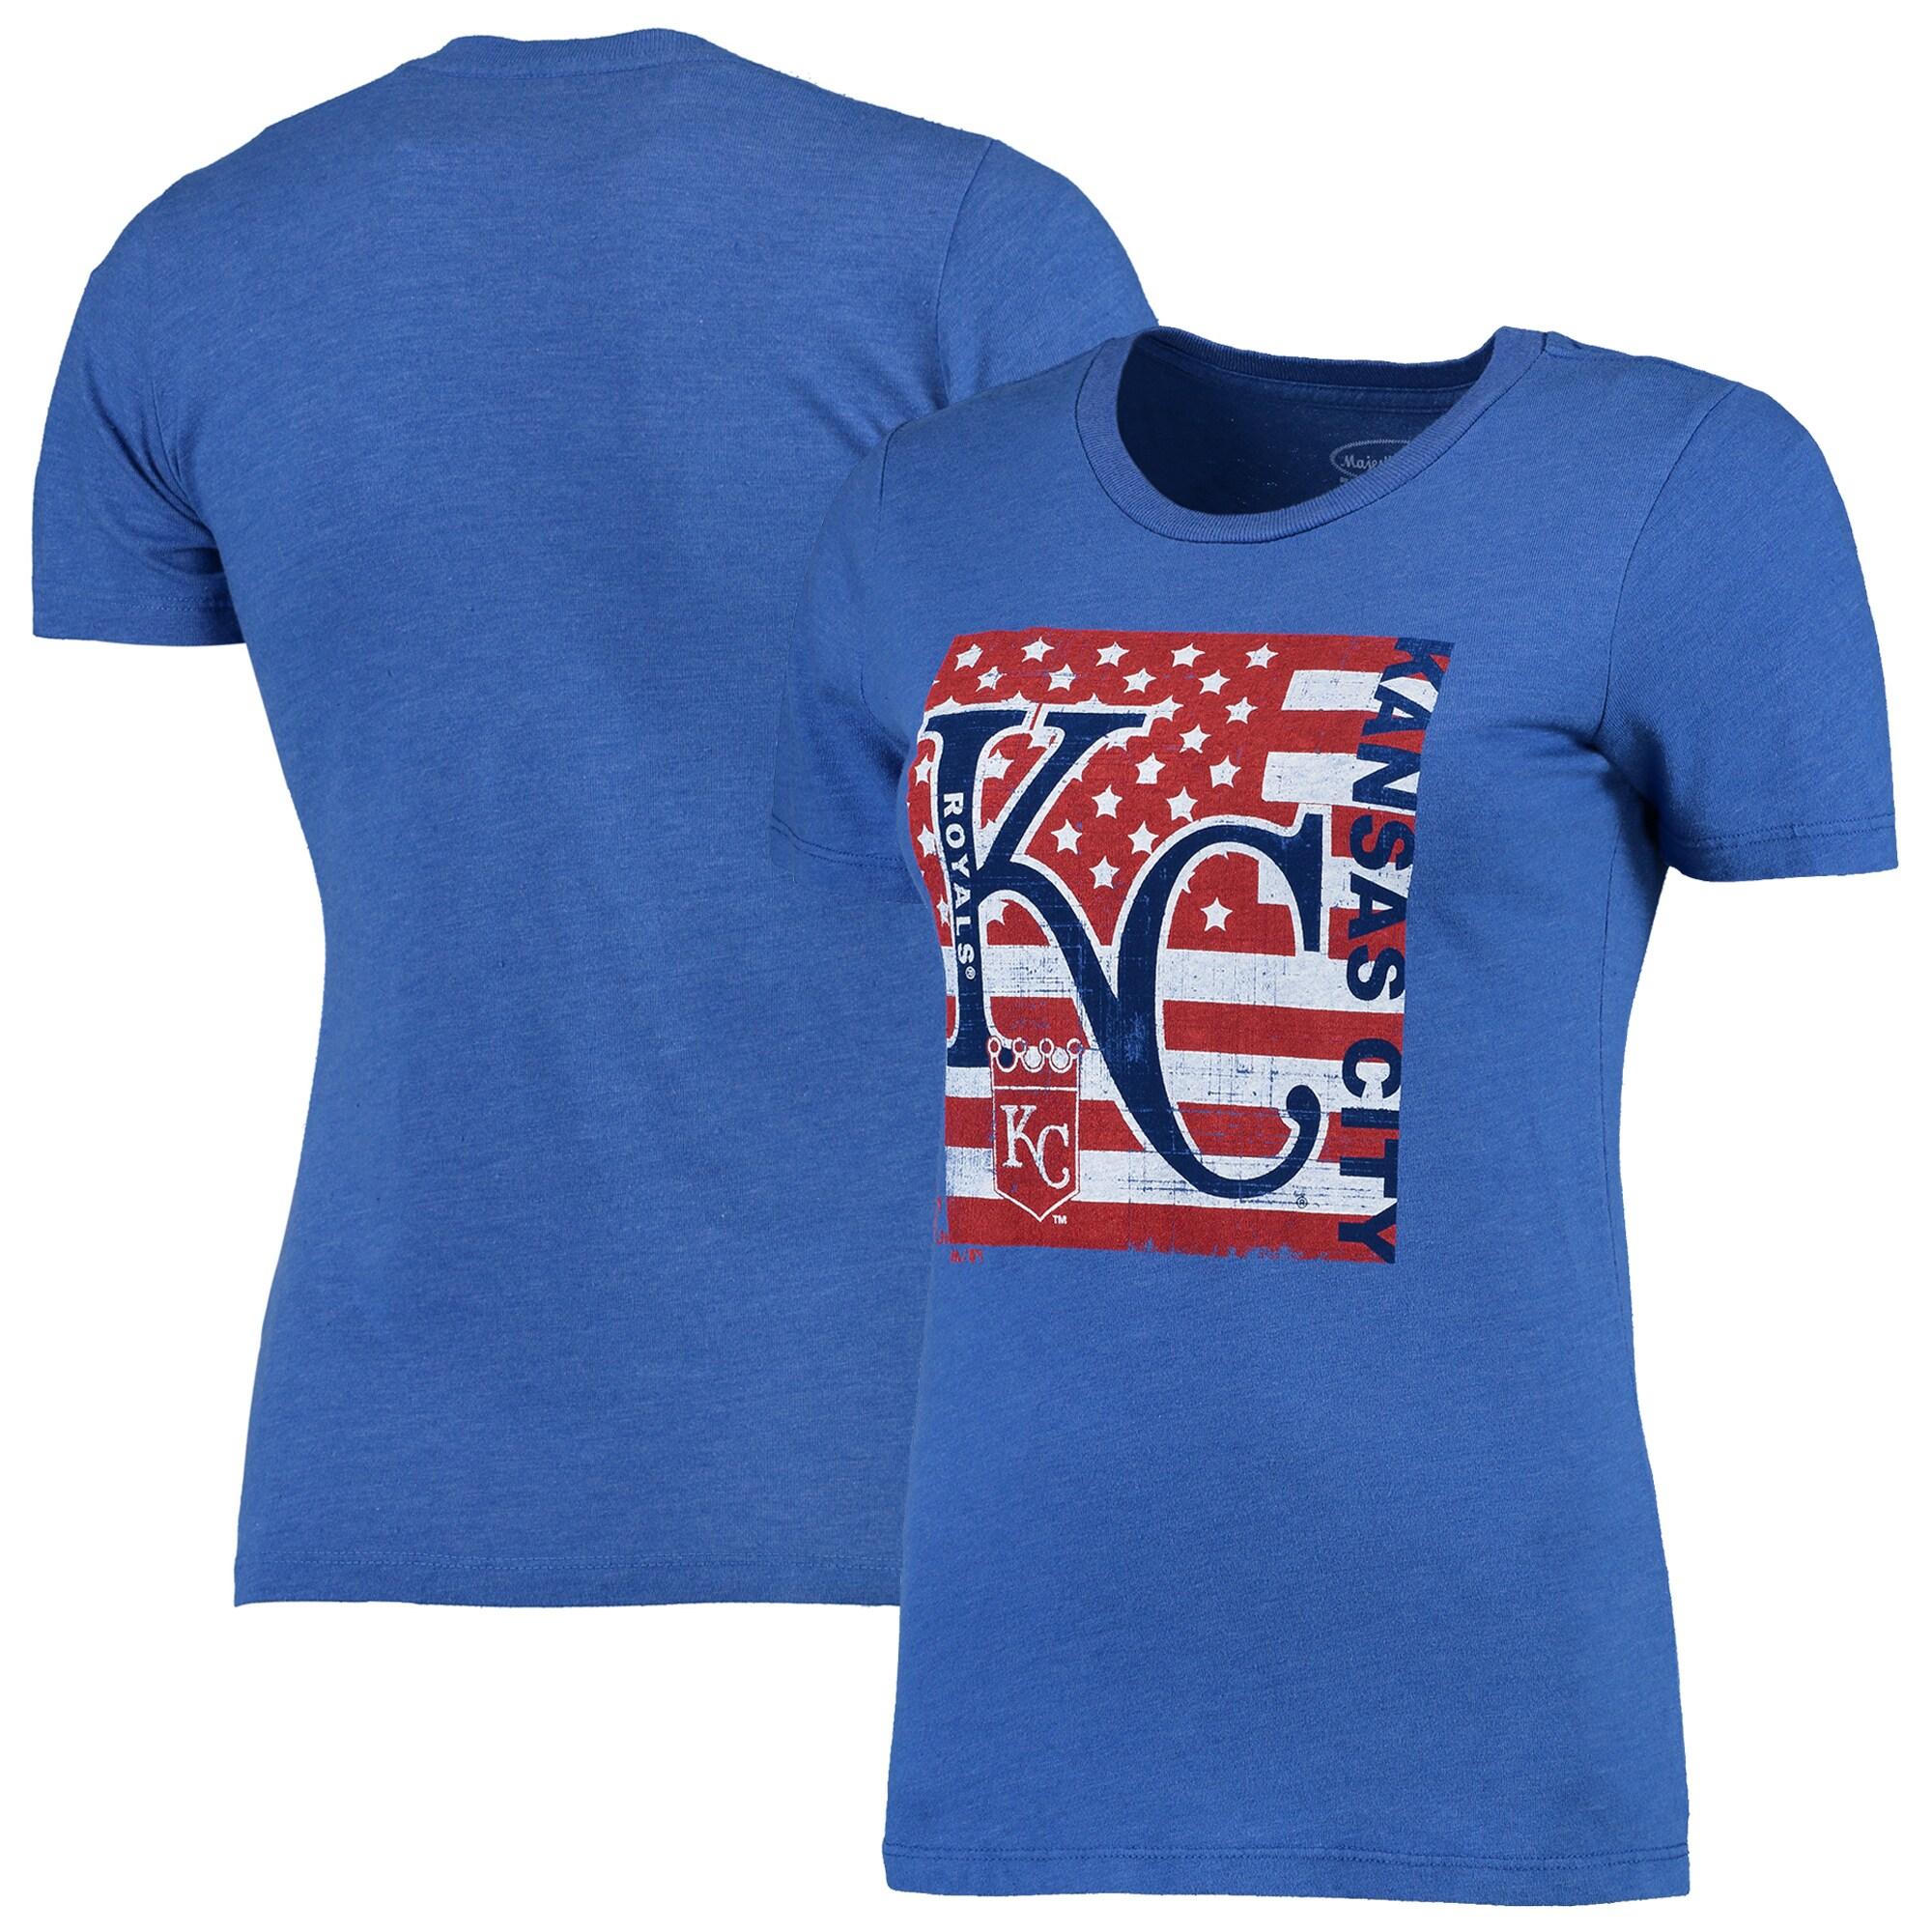 Kansas City Royals Majestic Threads Women's Stars & Stripes Flag T-Shirt - Royal